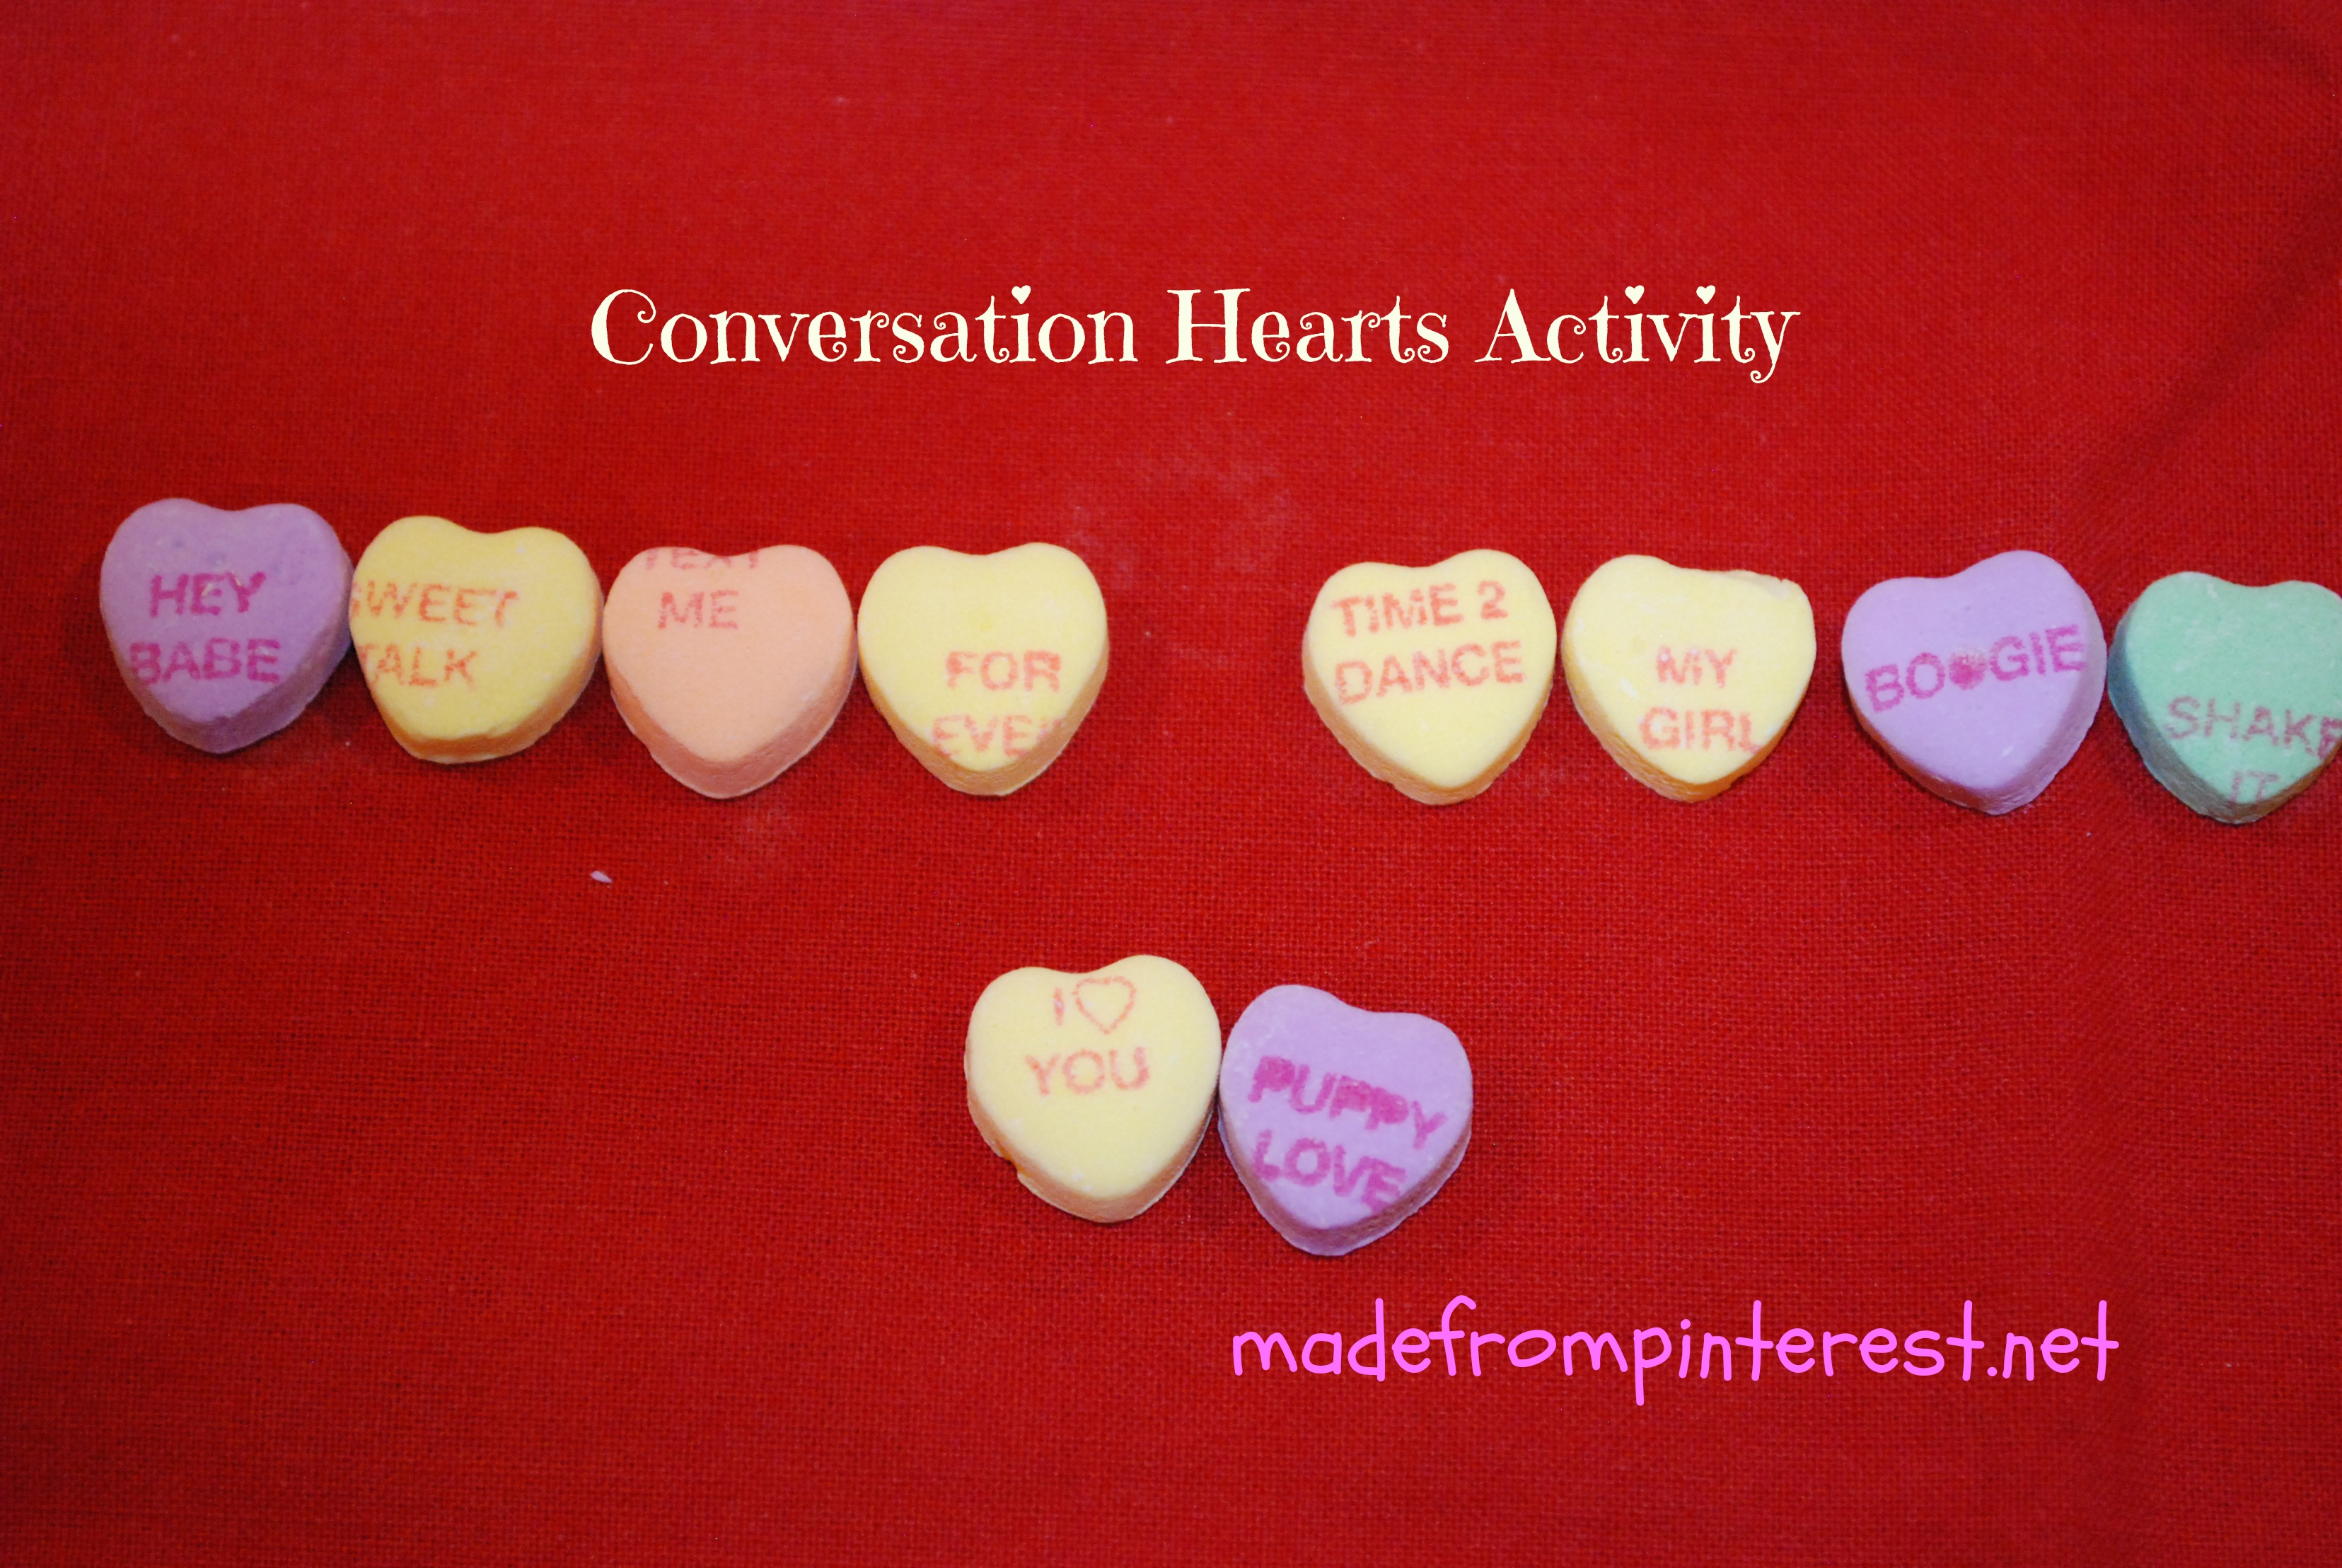 Conversation Hearts Activity